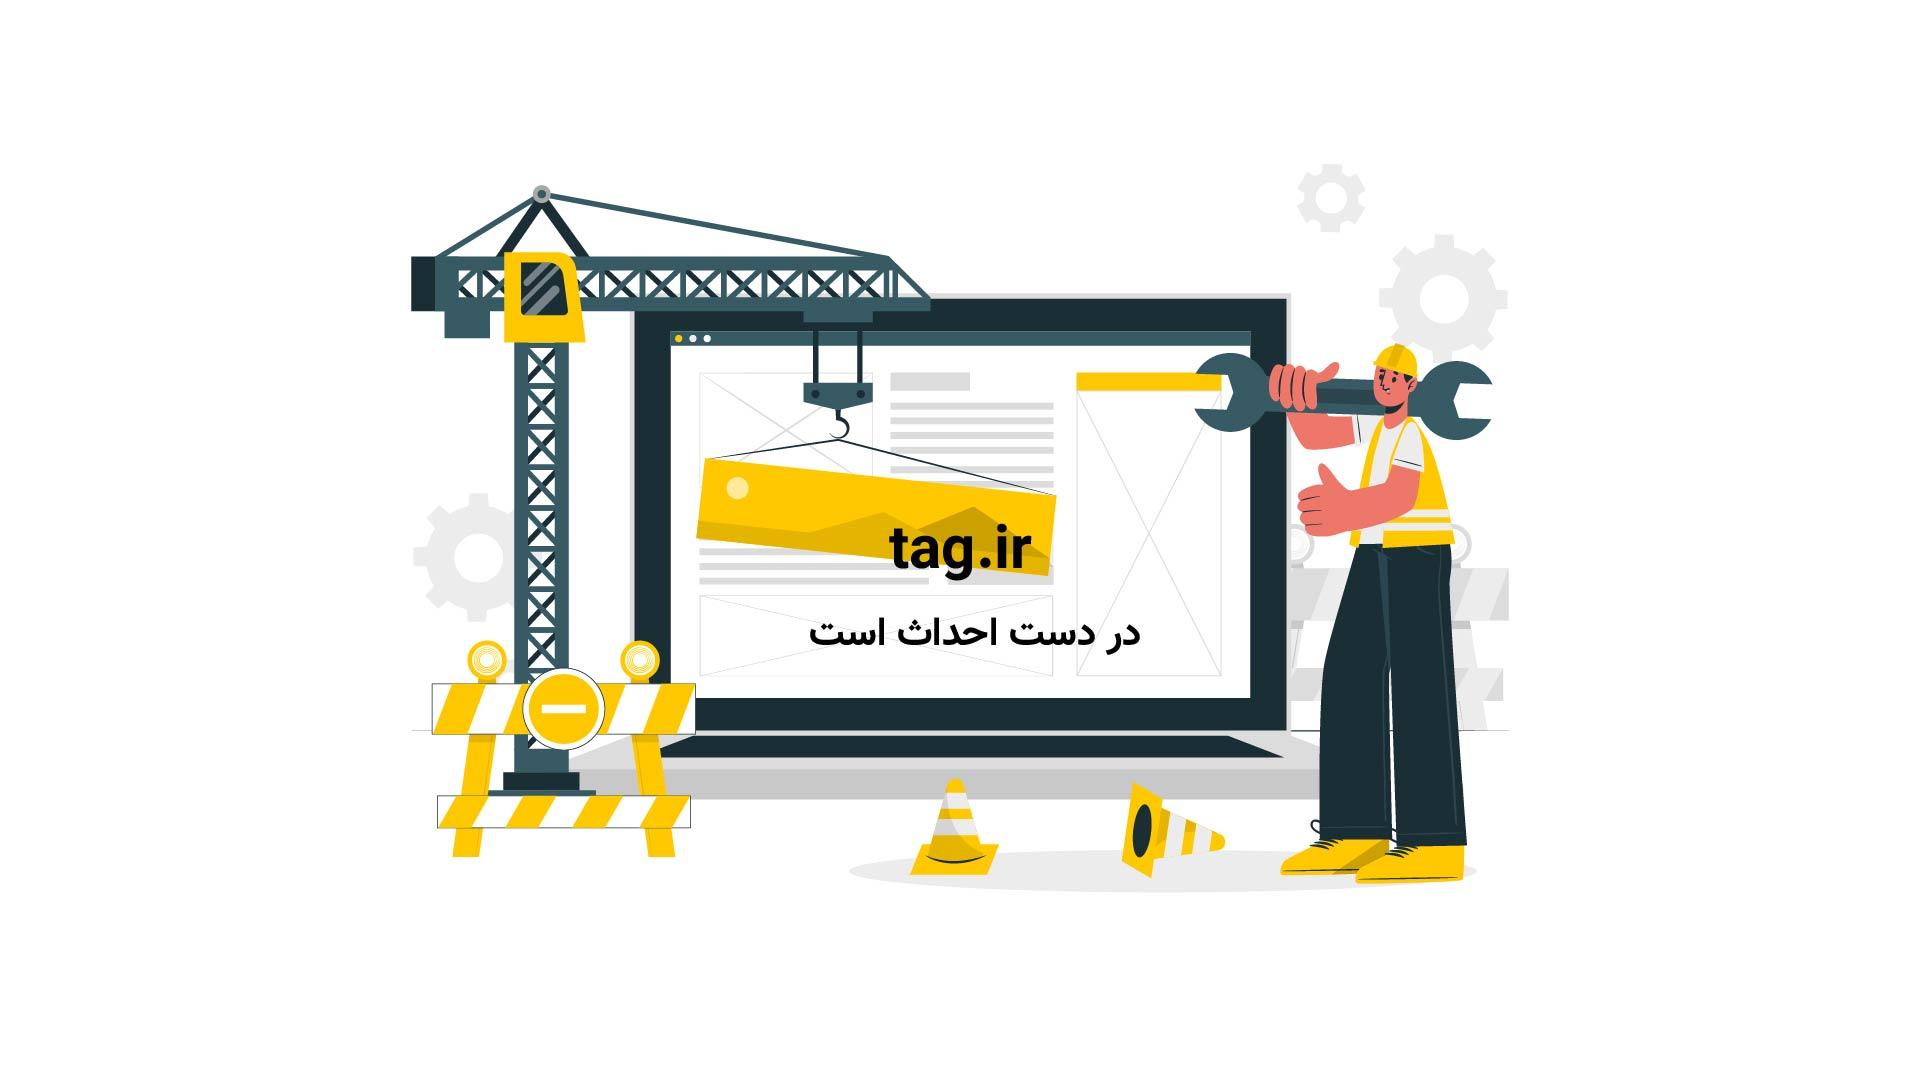 تصادف-موتو-و-کامیون | تگ